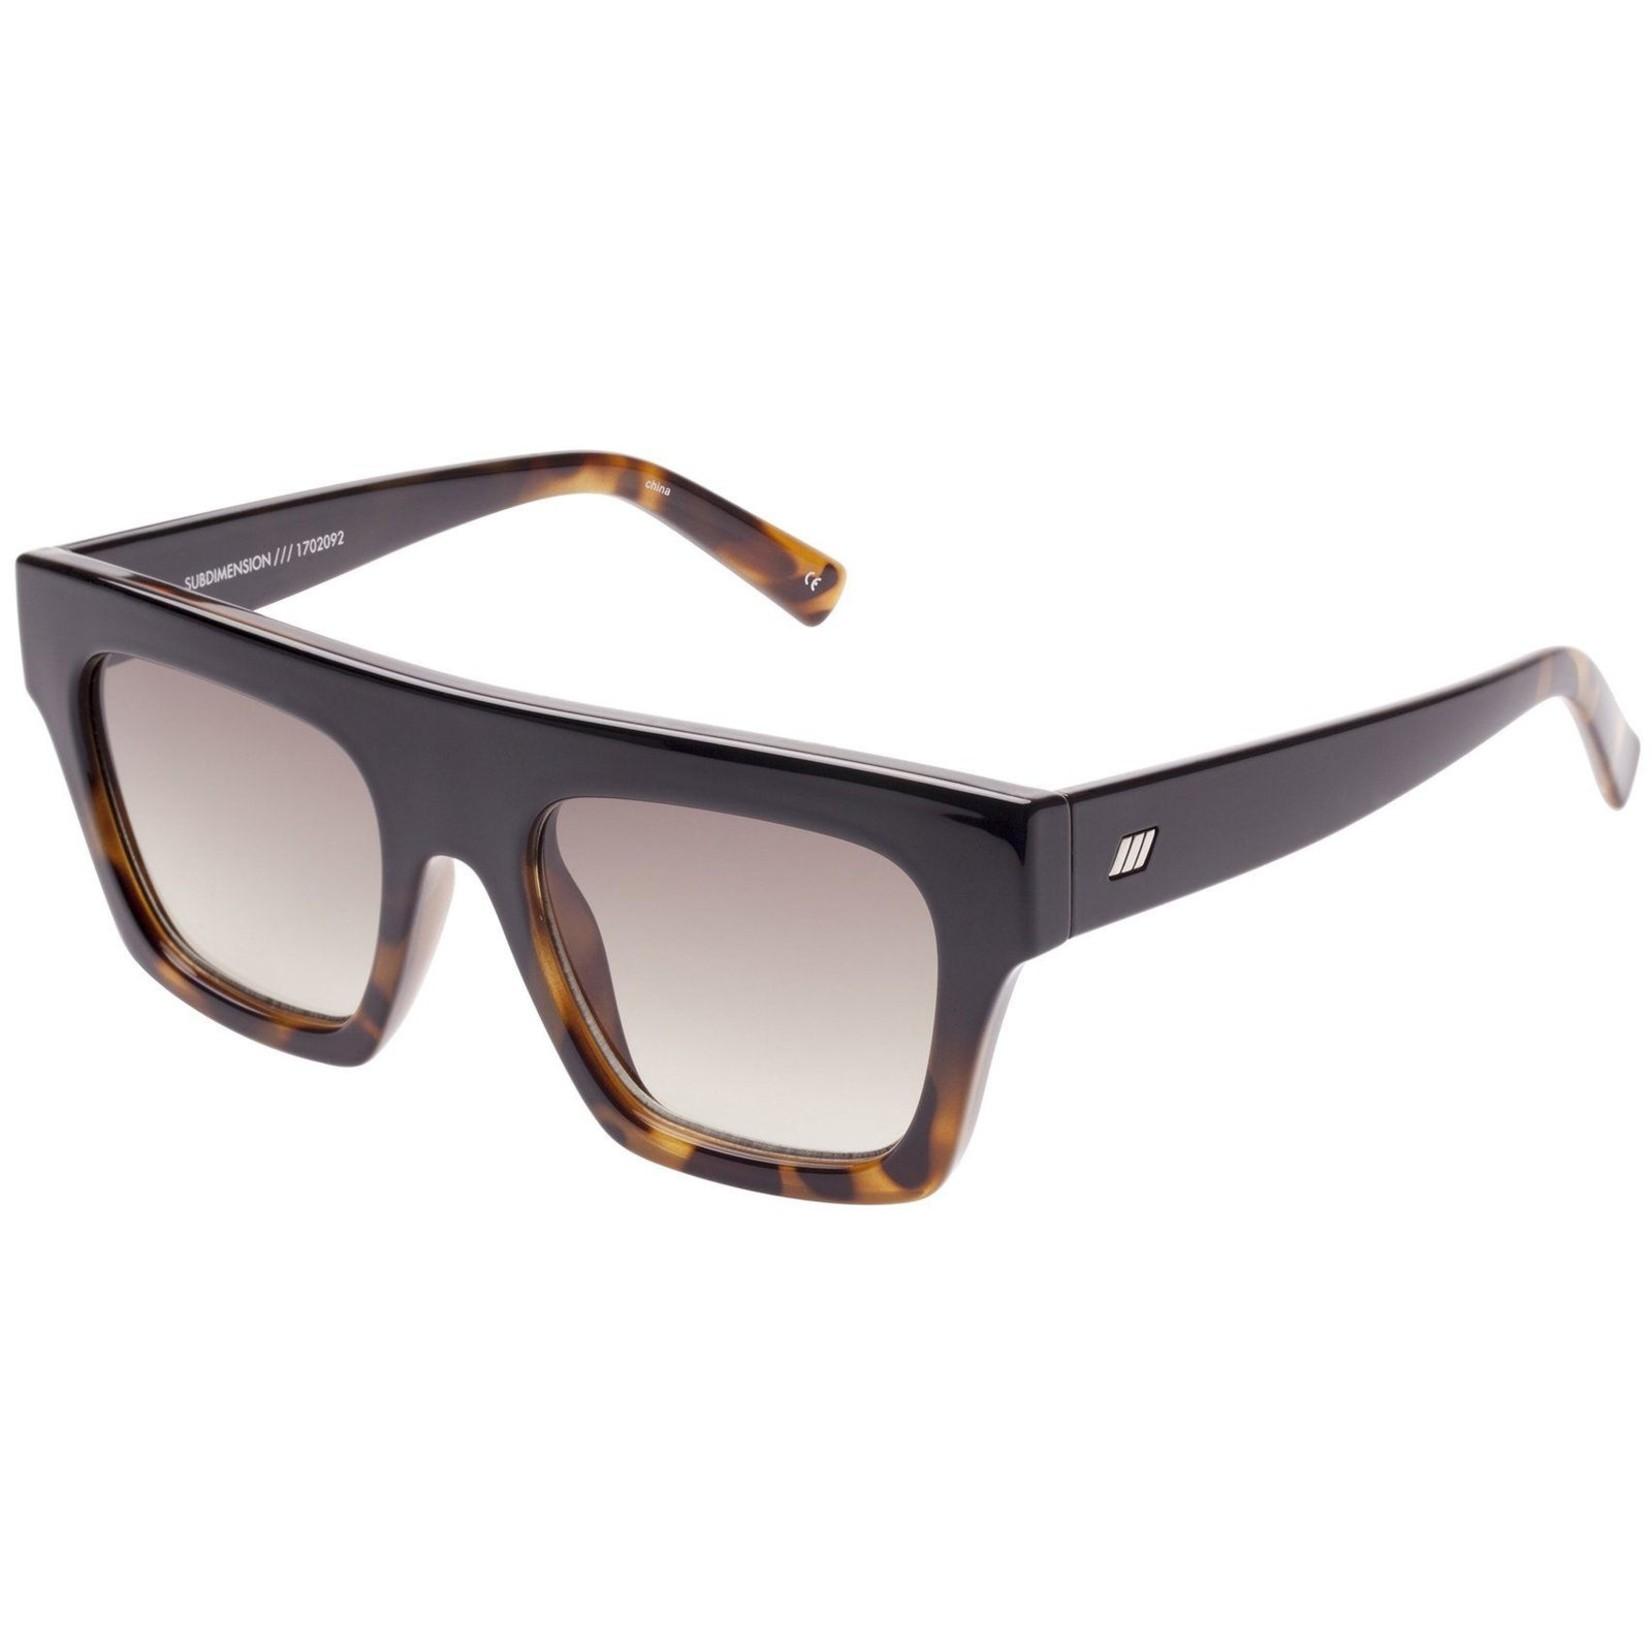 Le Specs Le Specs Subdimension Sunglasses